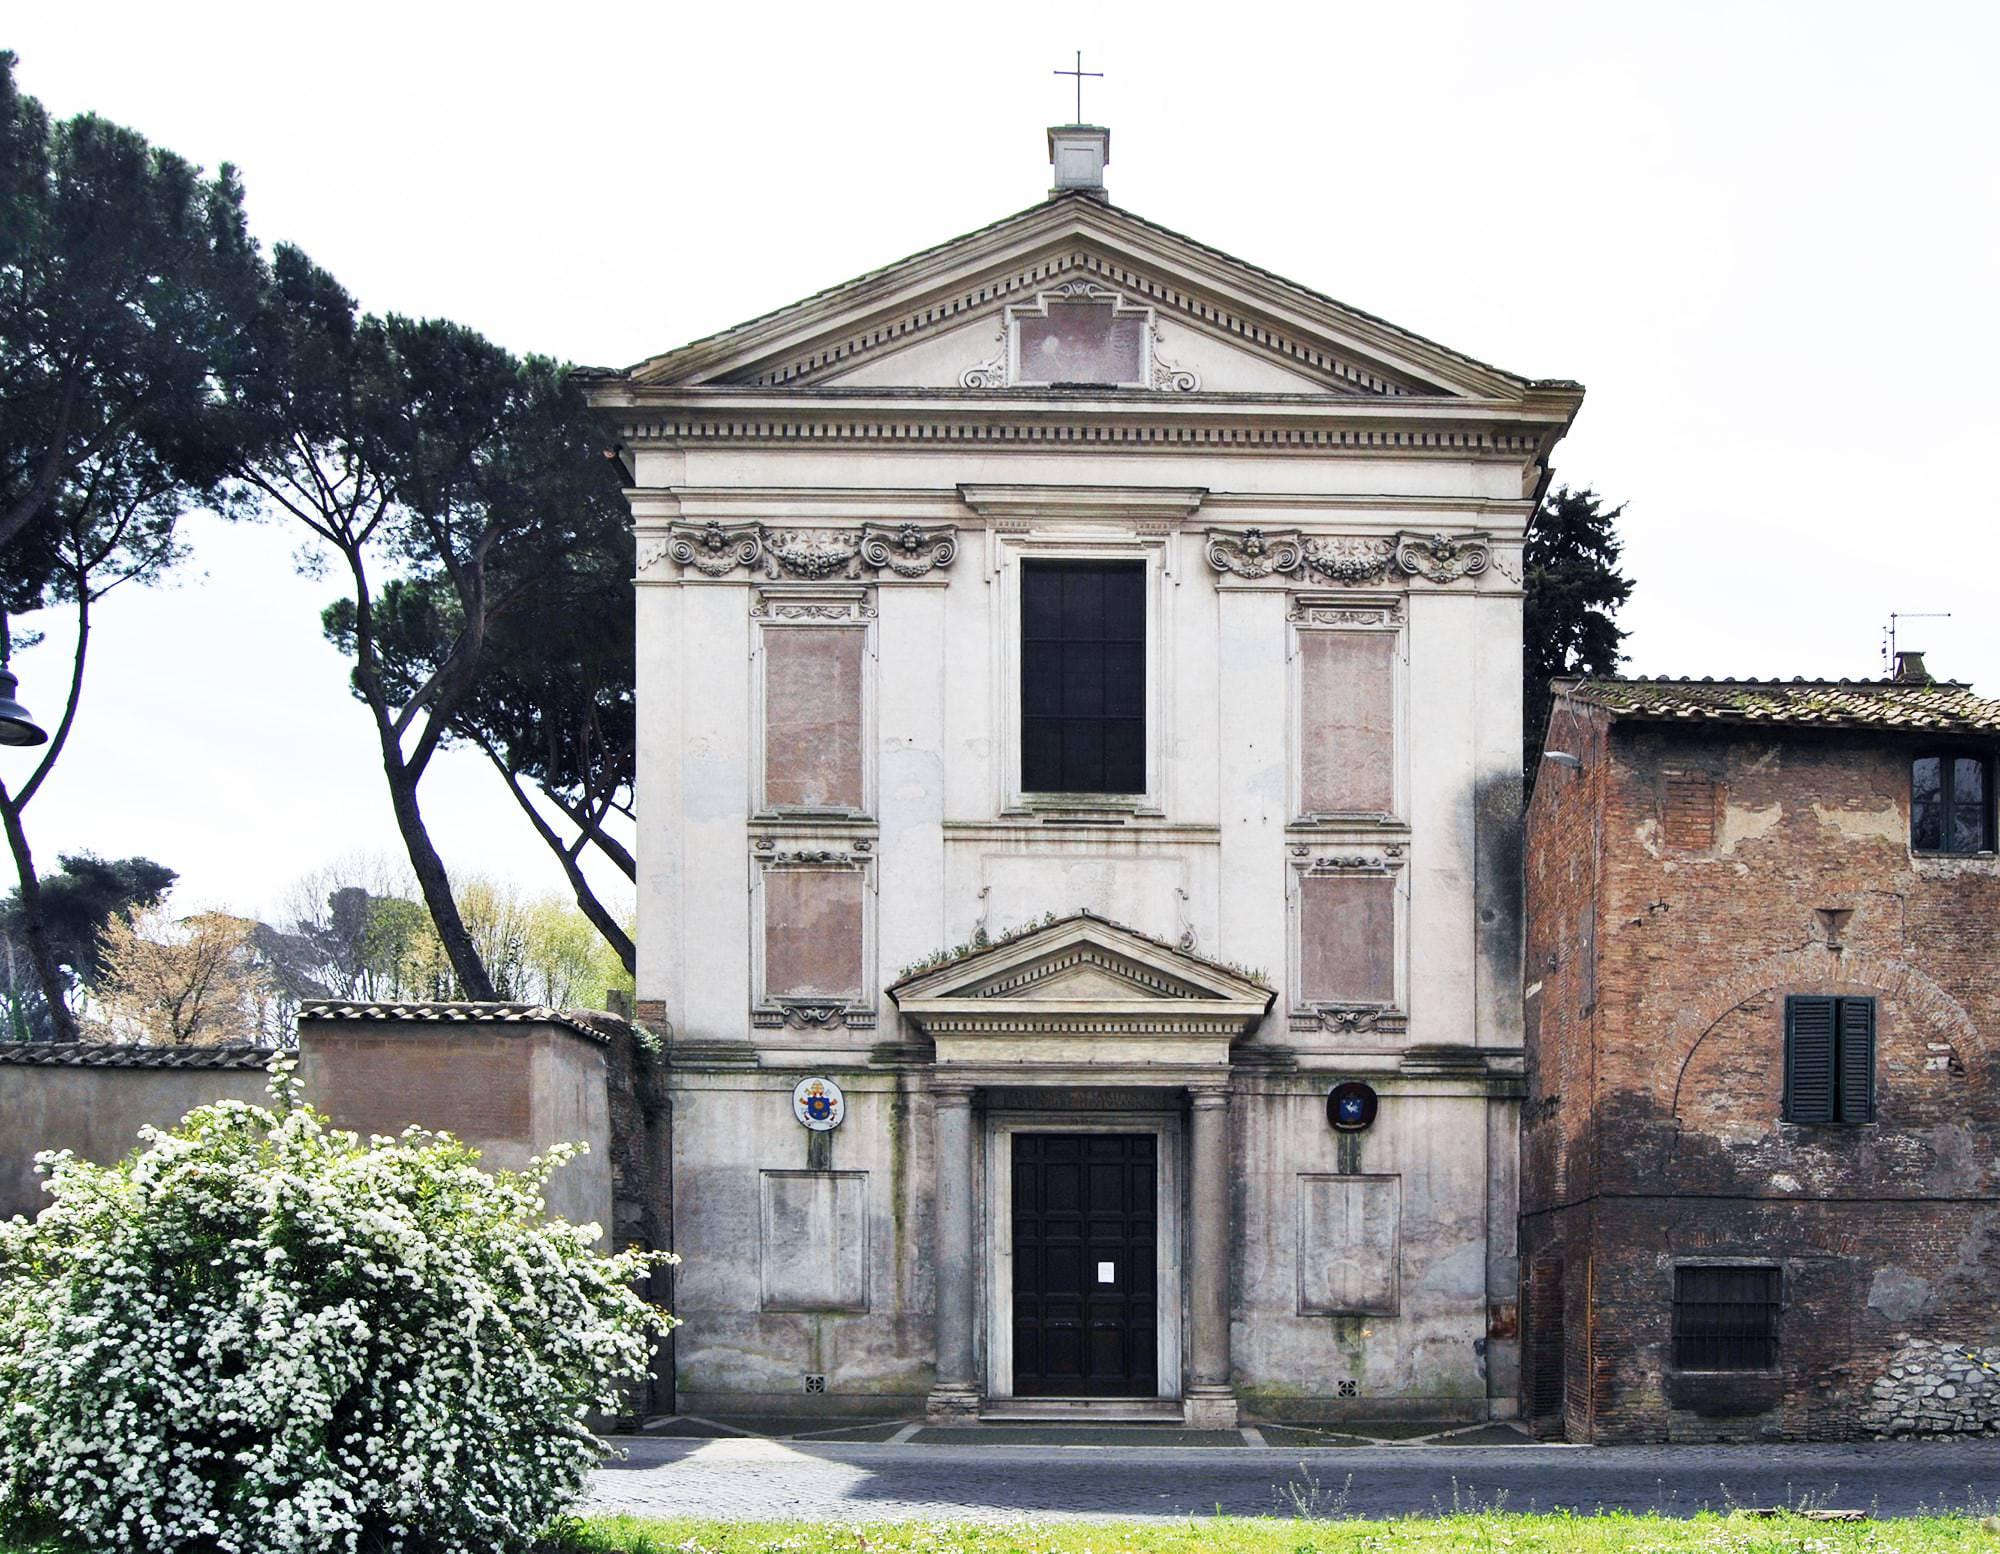 Basilica di San Cesareo de Appia